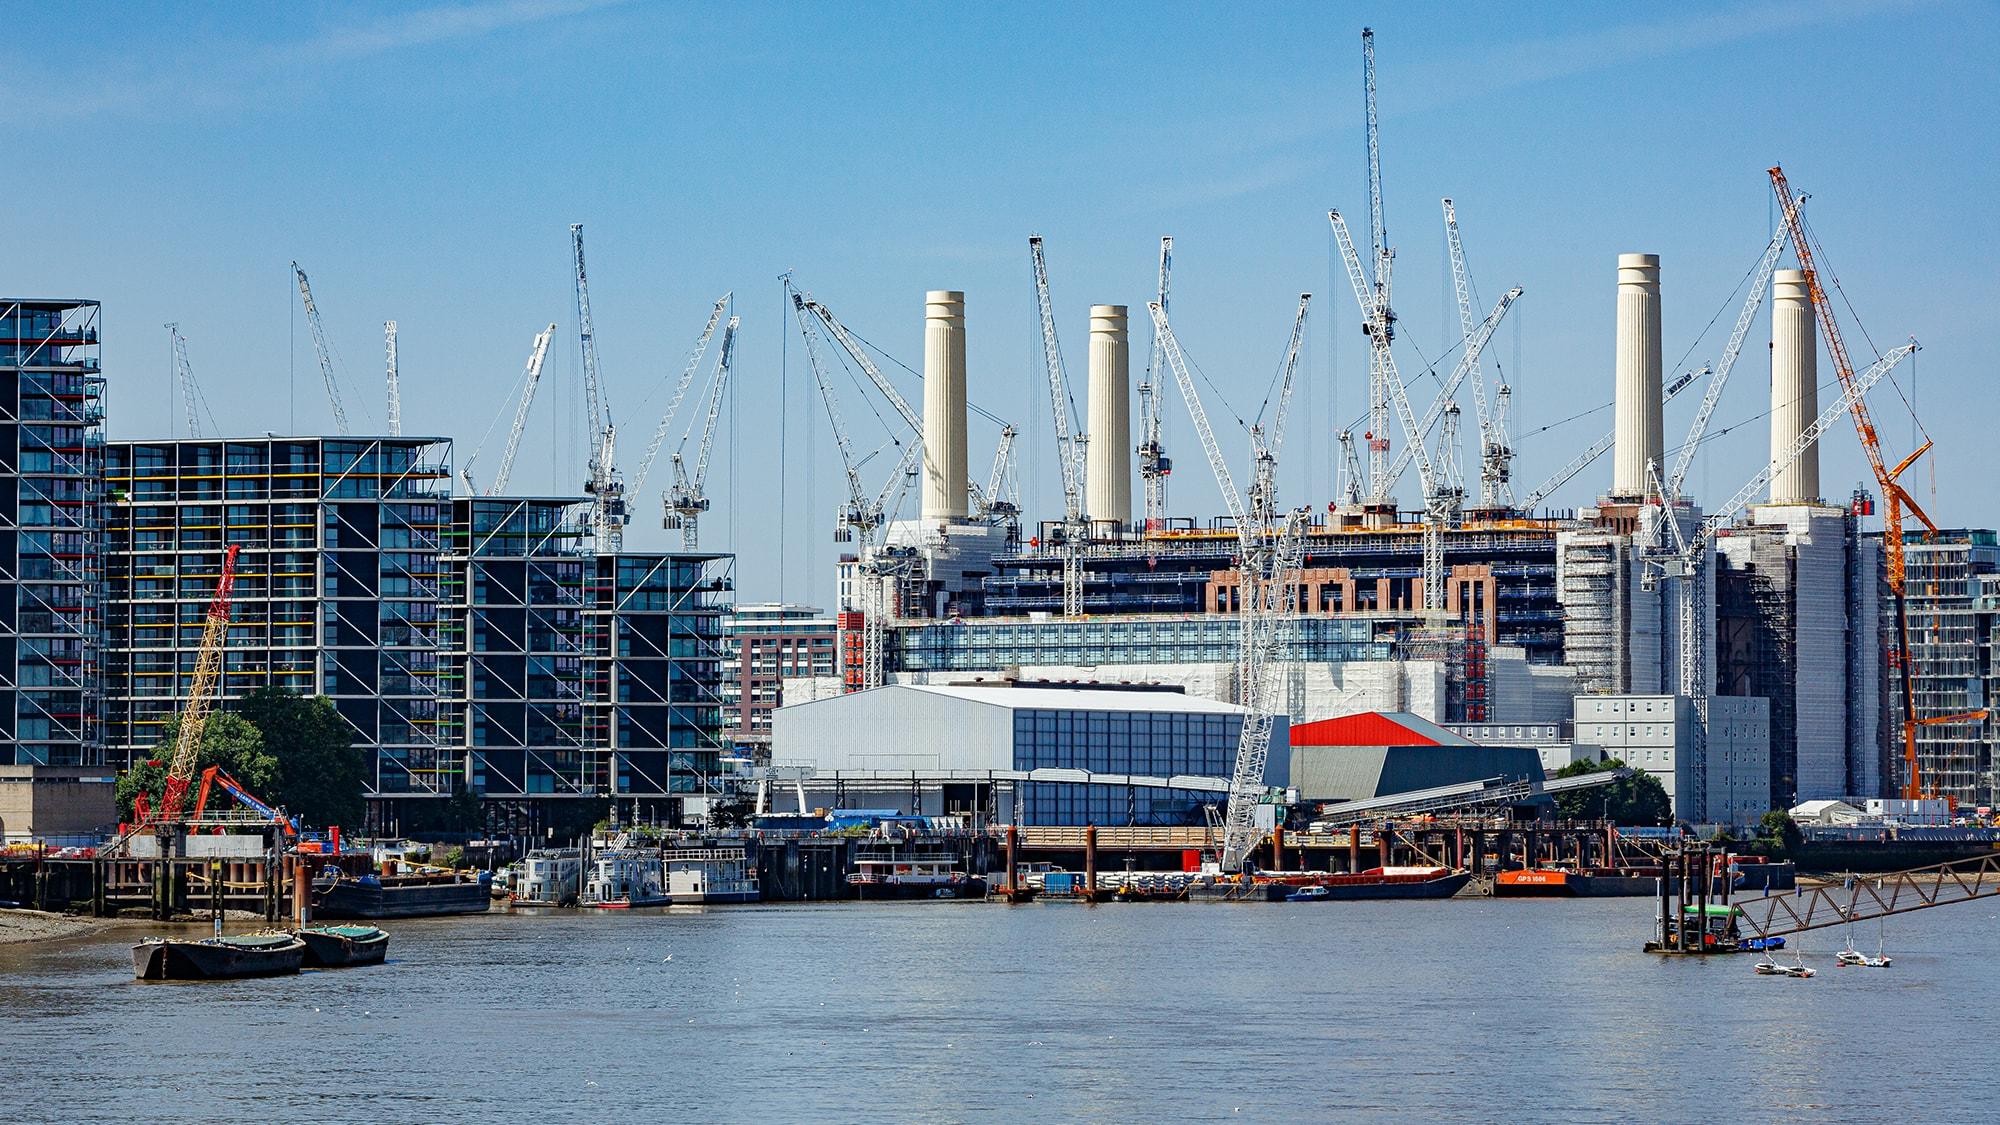 battersea-power-station-phase-2-image-1-min